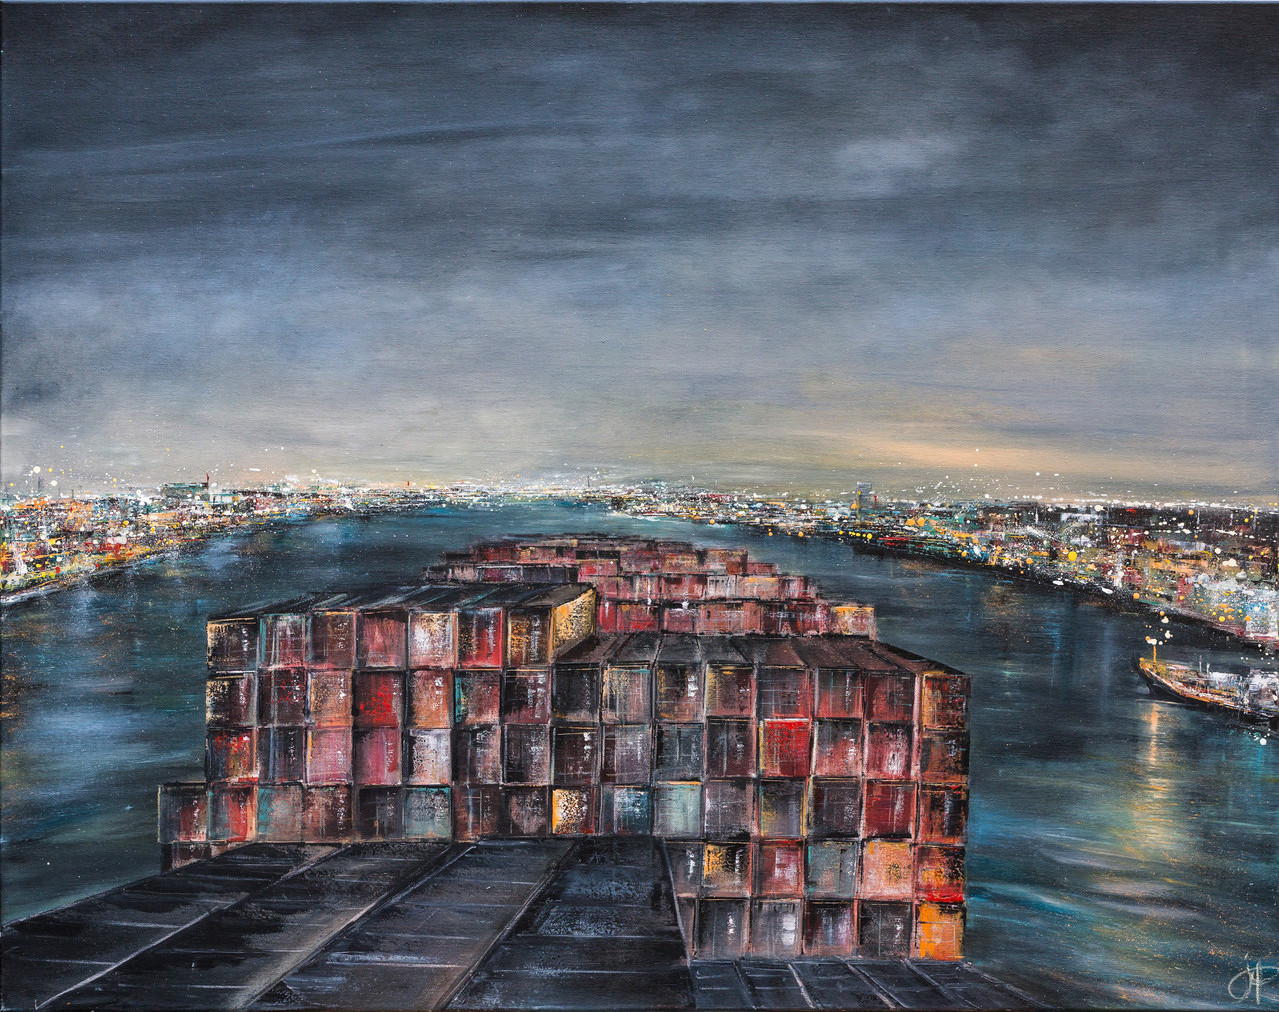 Rotterdam, 140 cm x 110 cm, Öl auf leinwand, 2013